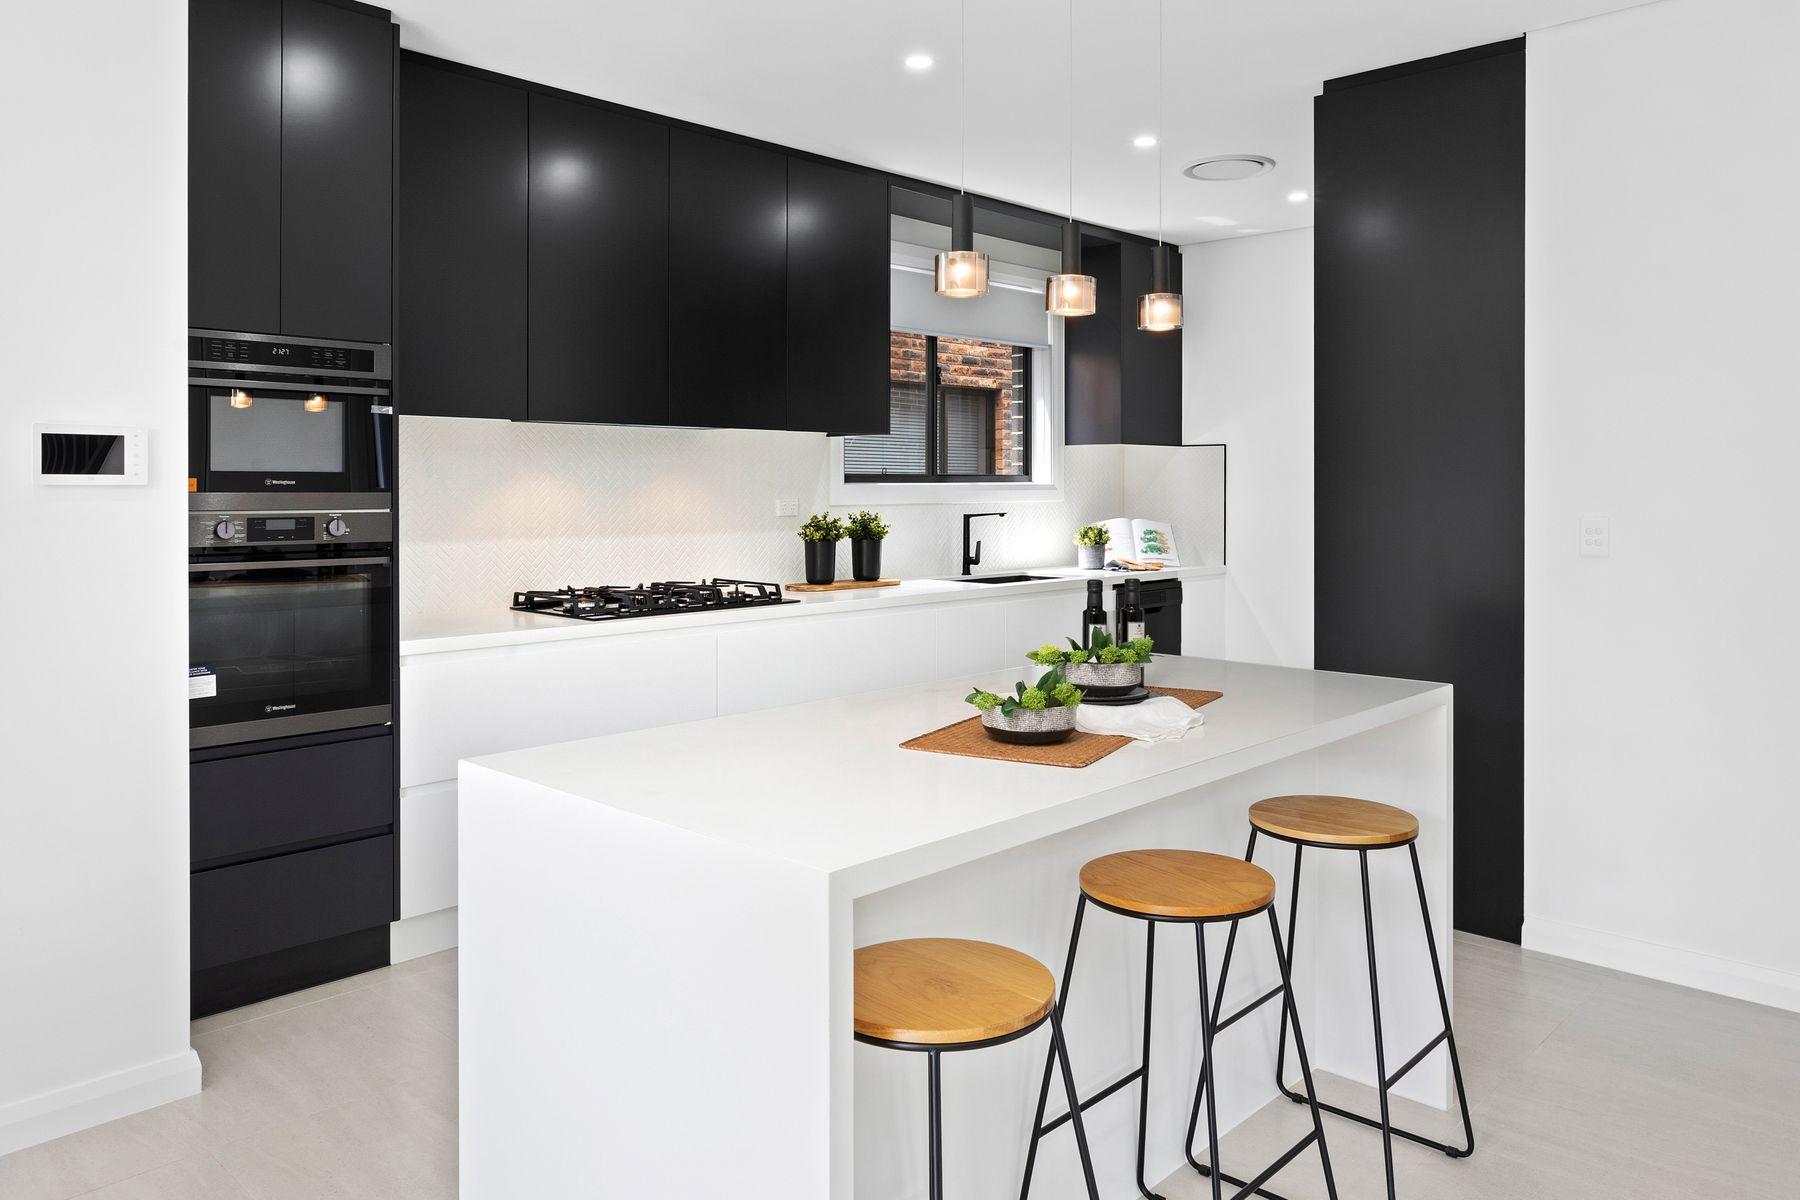 1 Heath Lane, Ryde, NSW 2112